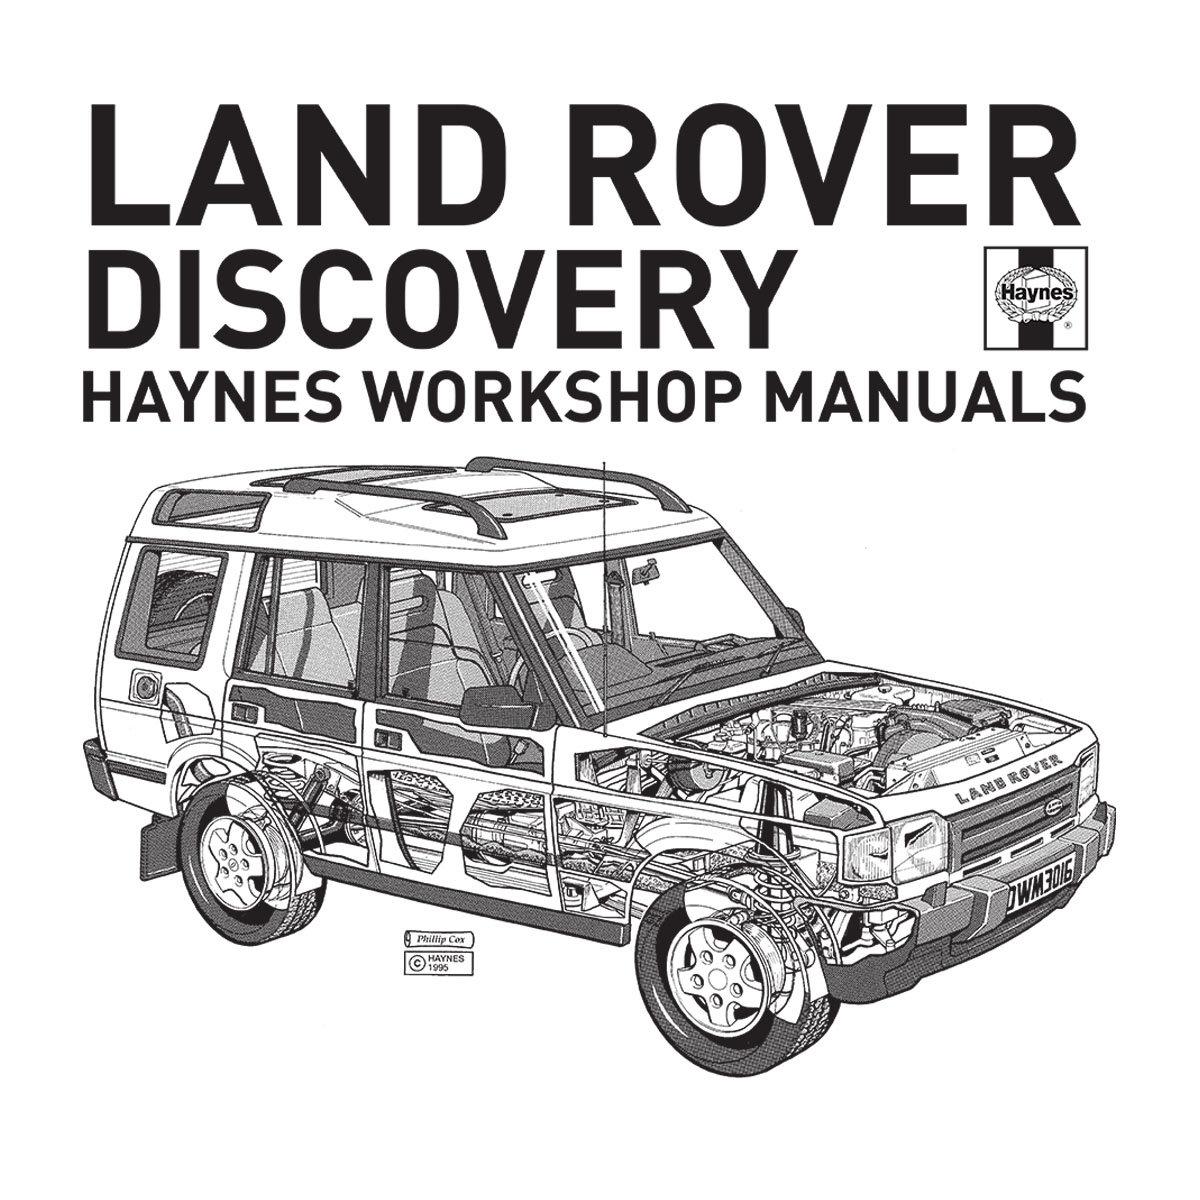 (XX-Large, White) Haynes Workshop Manual 3016 Land Rover